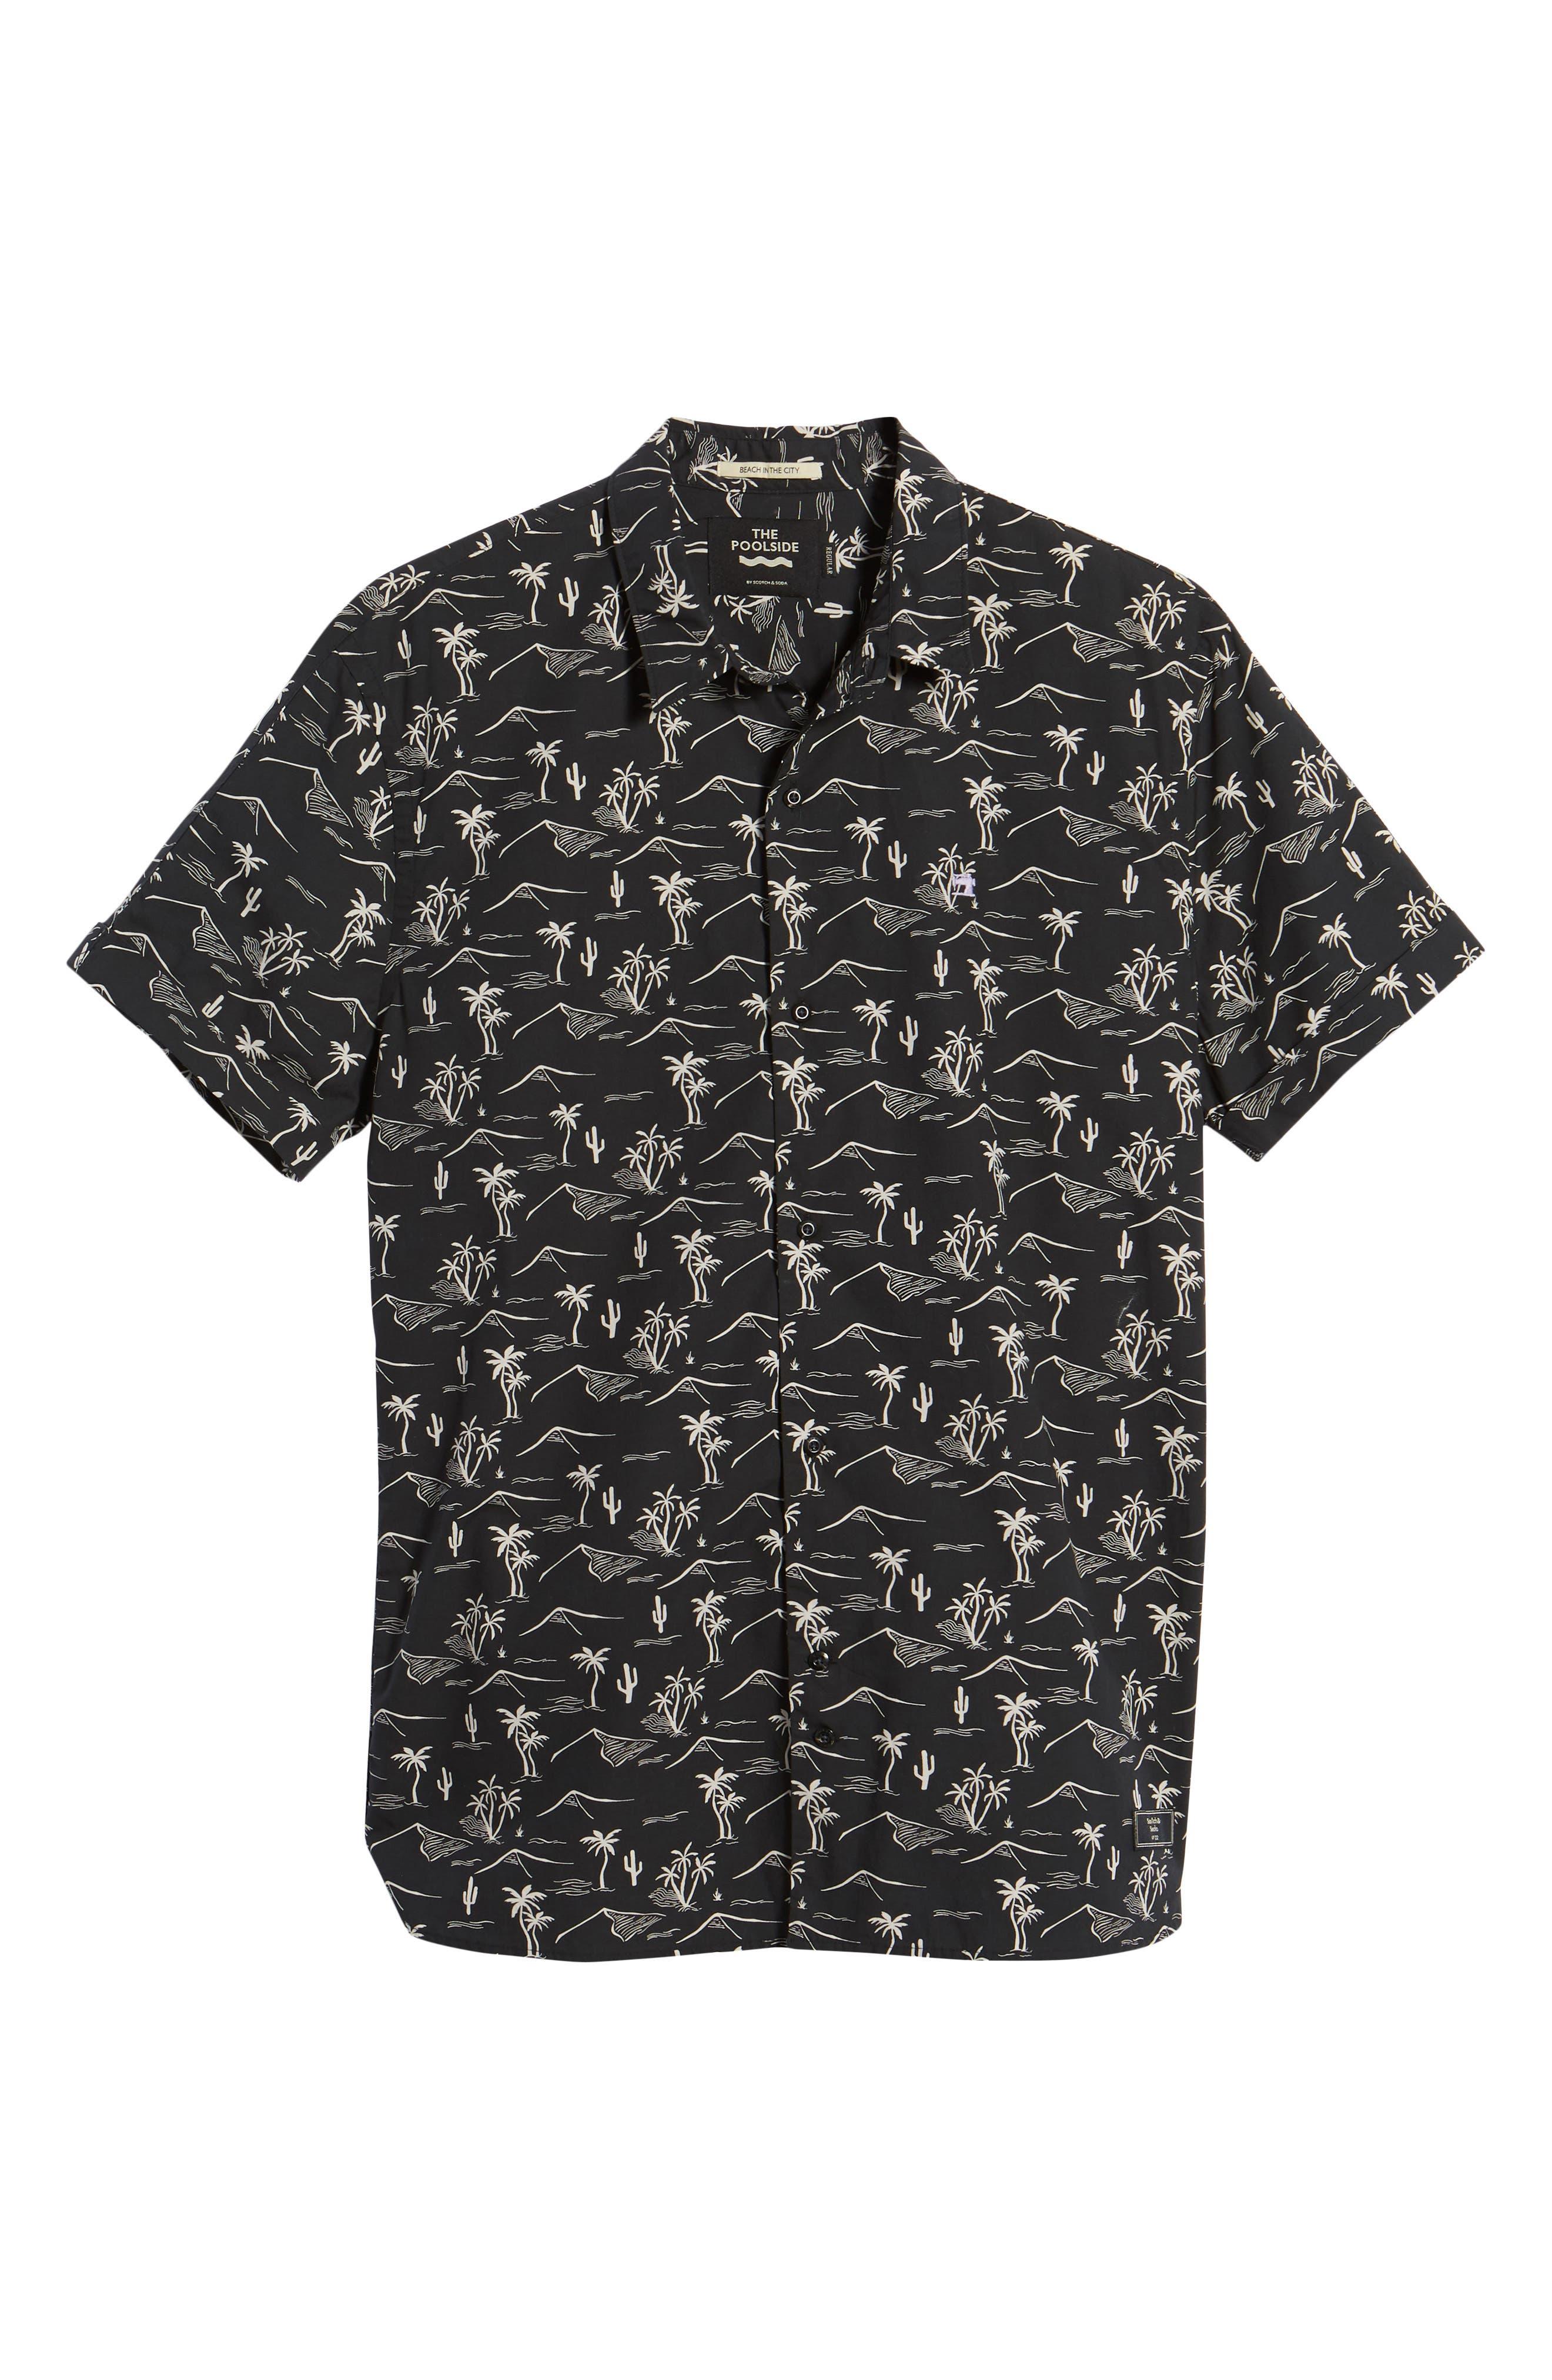 Poolside Woven Shirt,                             Alternate thumbnail 6, color,                             002